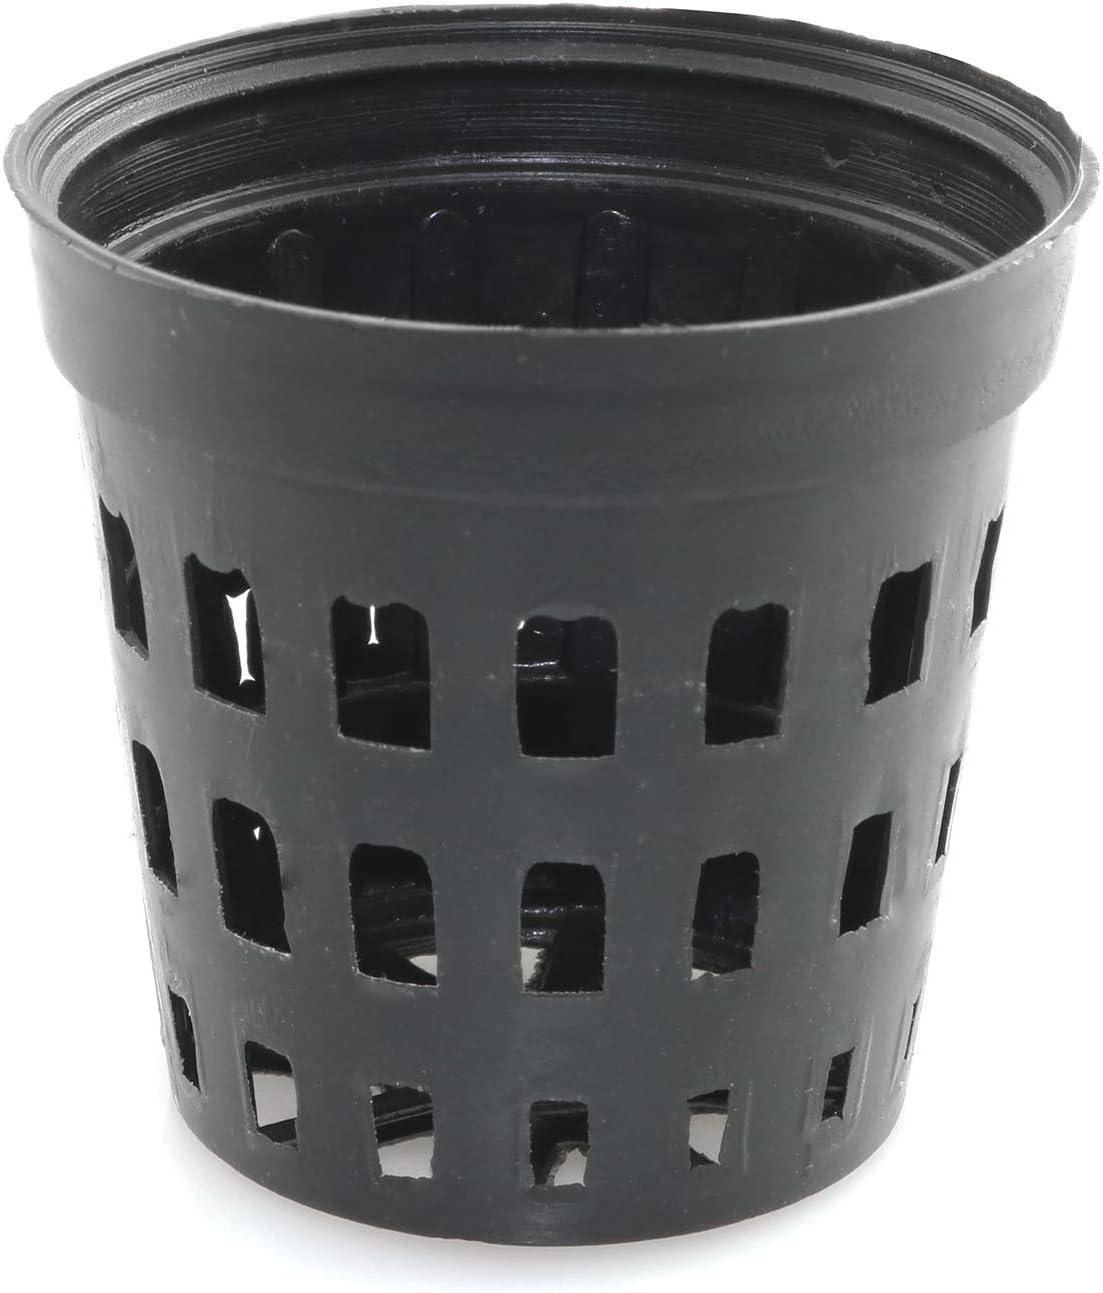 Tegg Garden Net Cups Pots 40PCS Heavy Duty Black Plastic Planting Mesh Net Hydroponic Plant Growth Insert Flower Pot Cup Basket